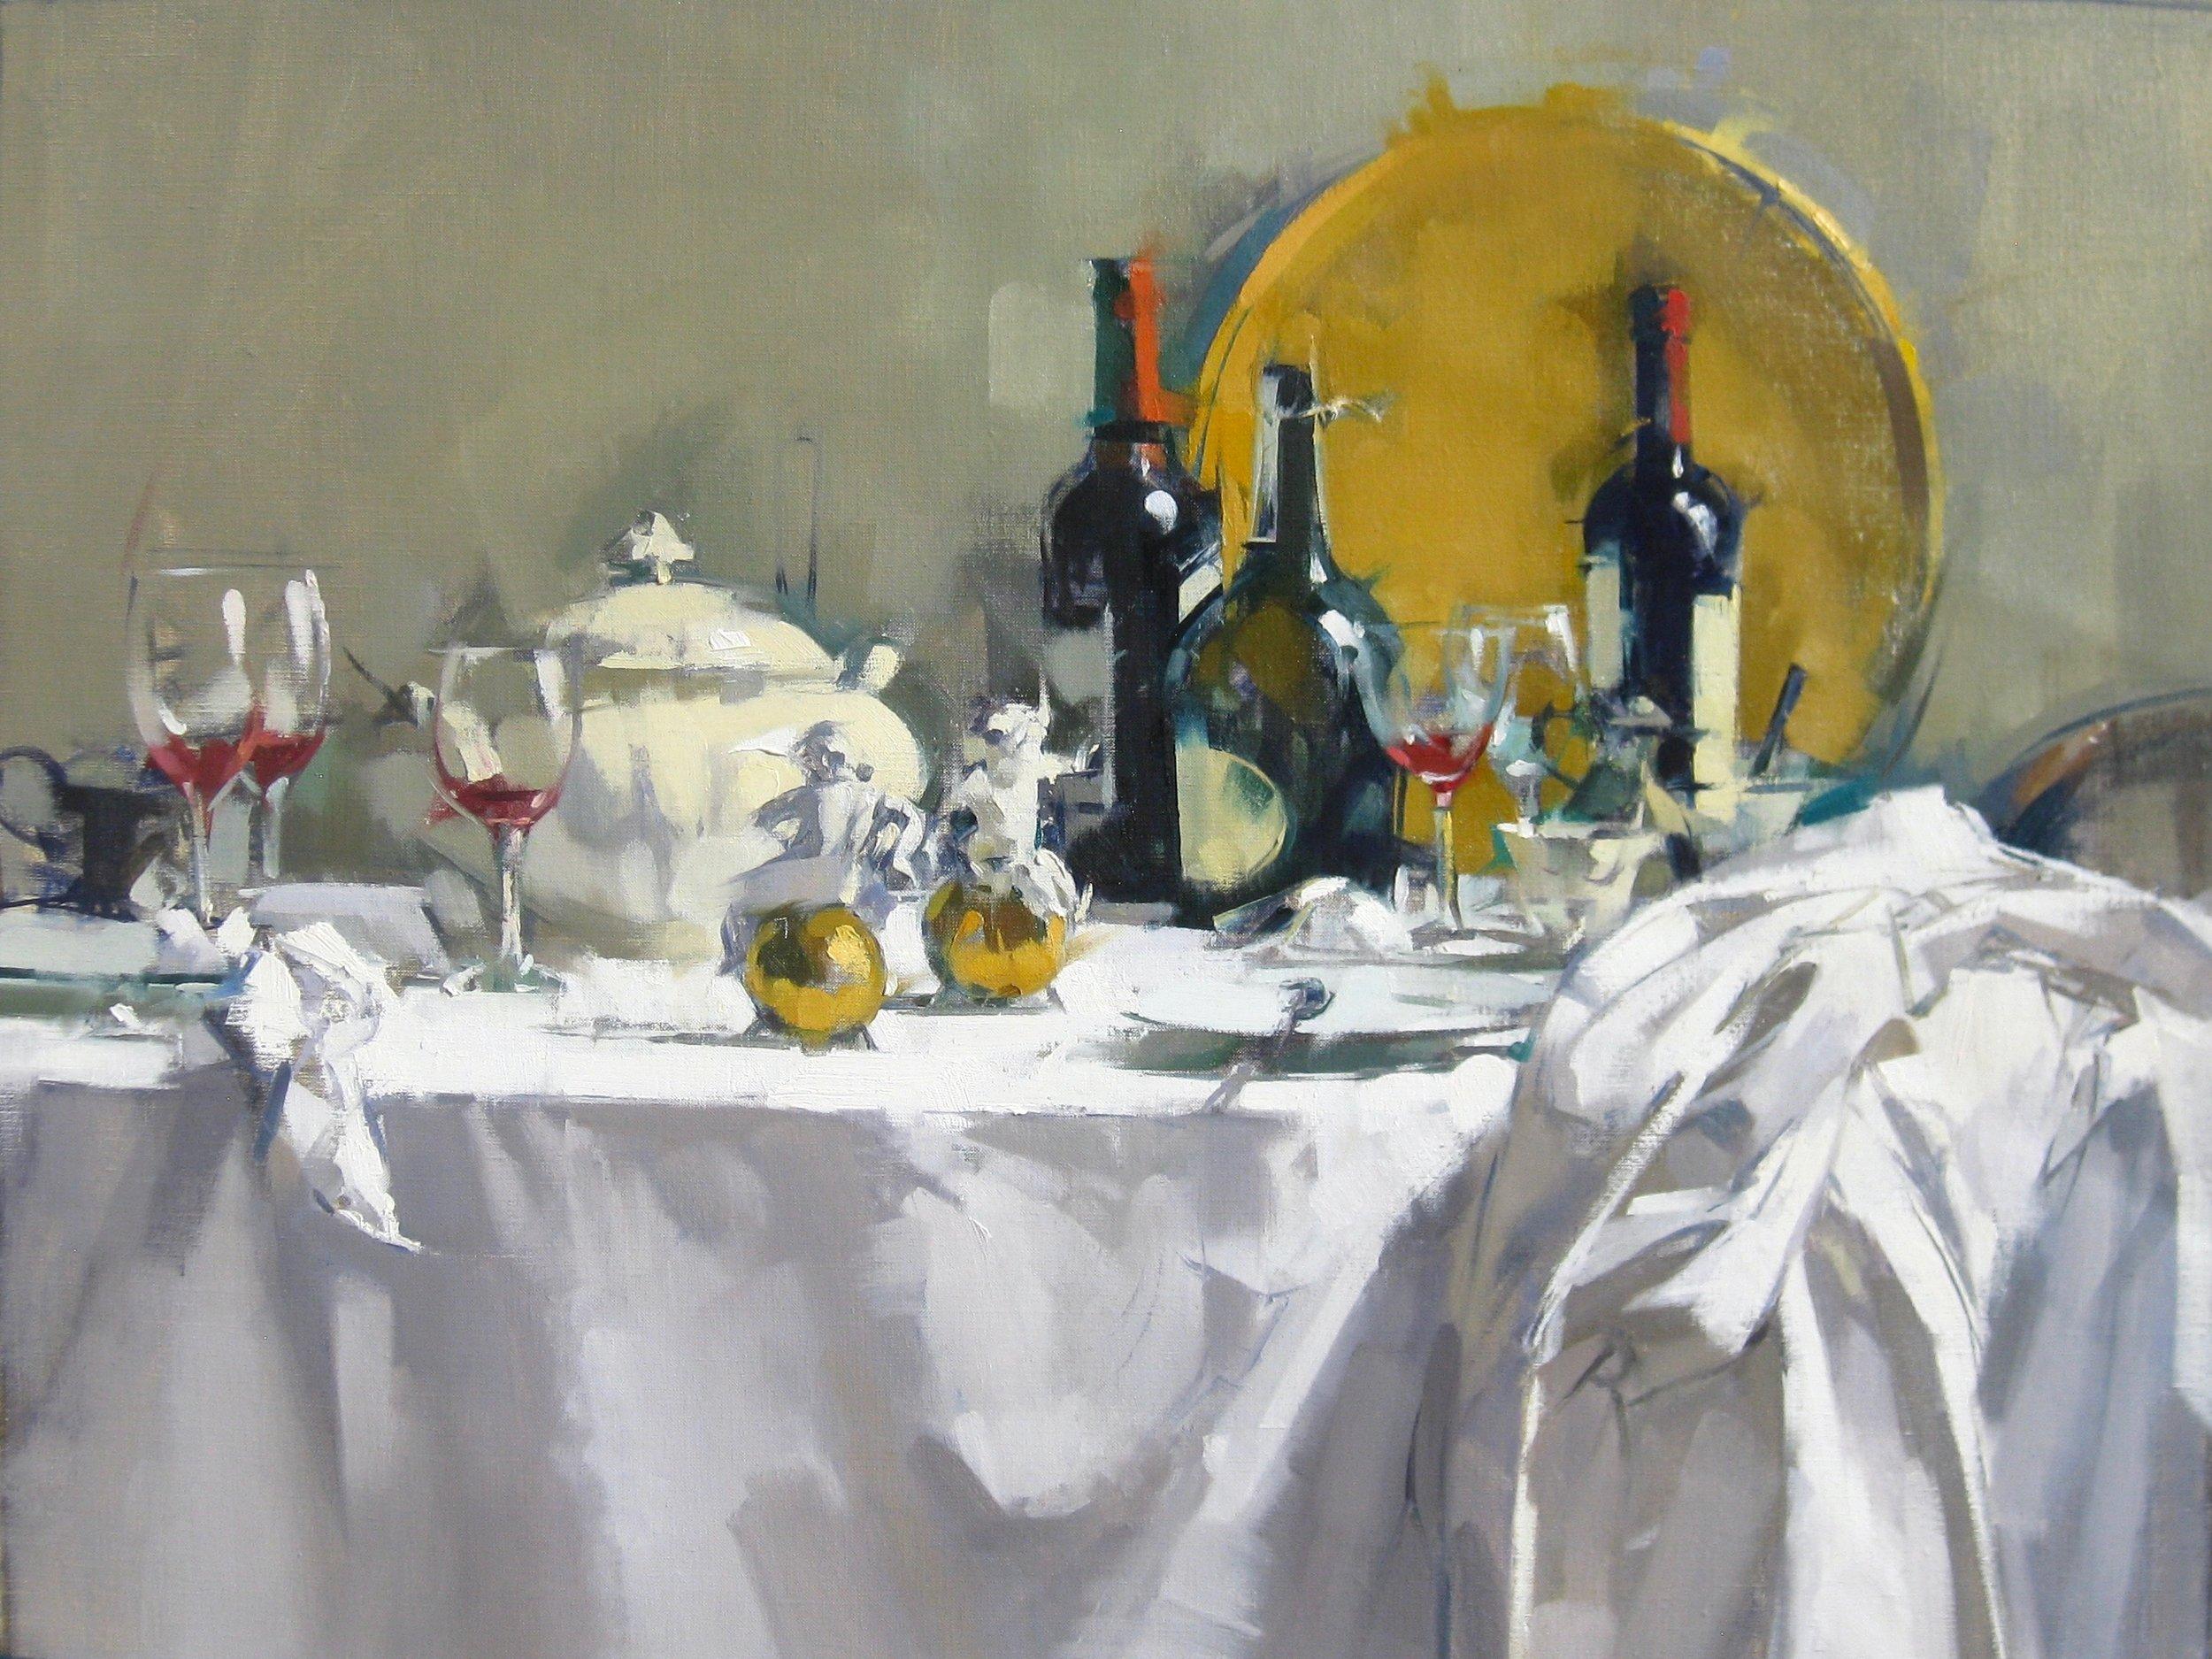 Maggie Siner, Putti on Table, Oil on Linen, 24x32, $6,200.jpg